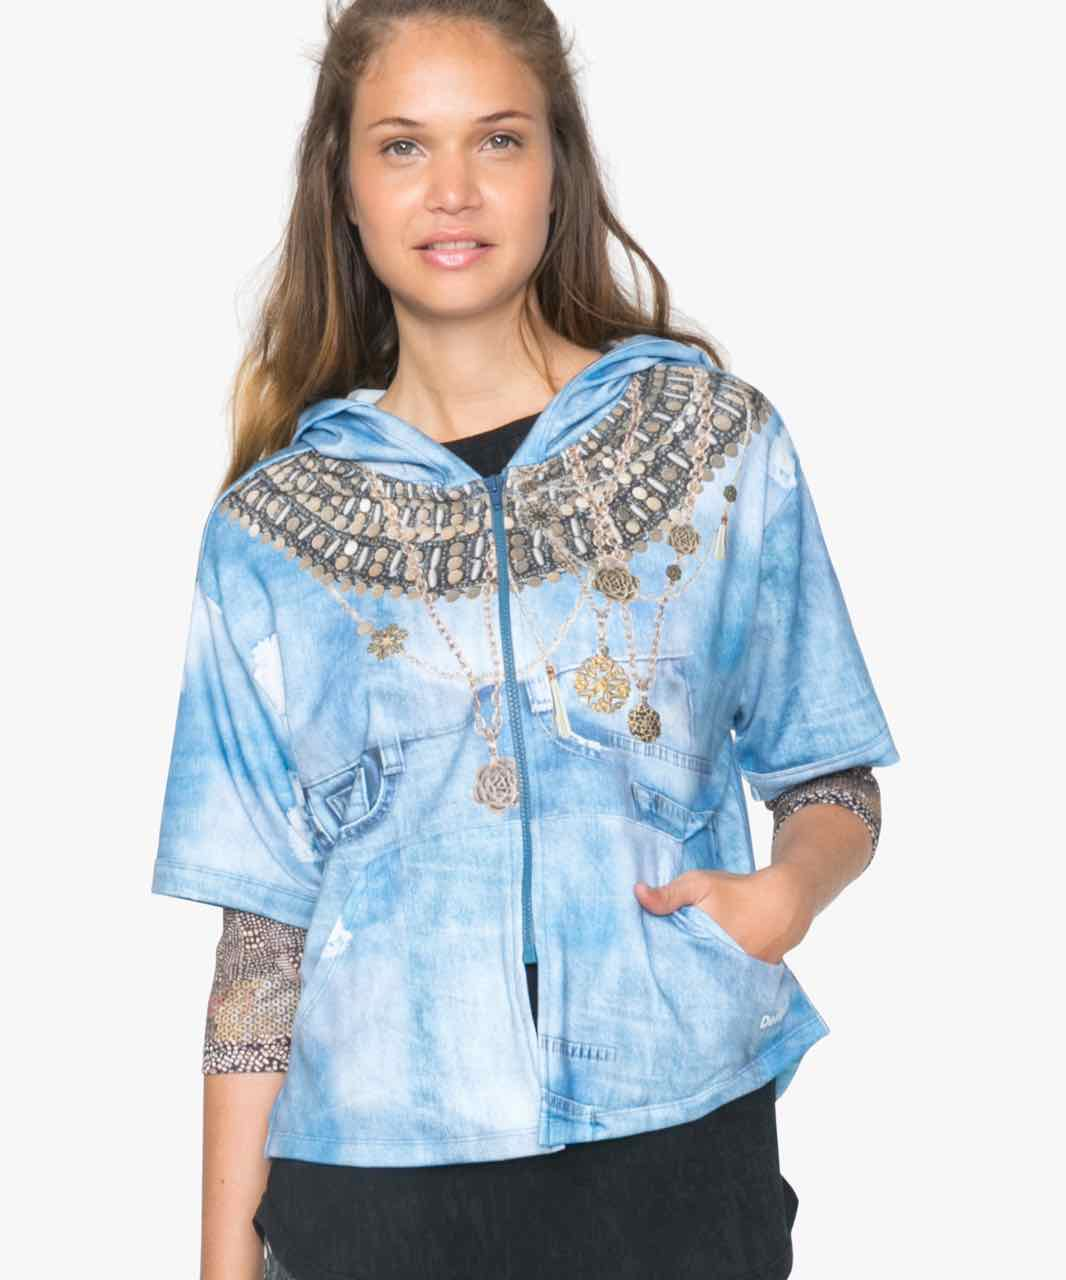 71S2SA3_5006 Desigual Sport L Sweater Y Buy Online